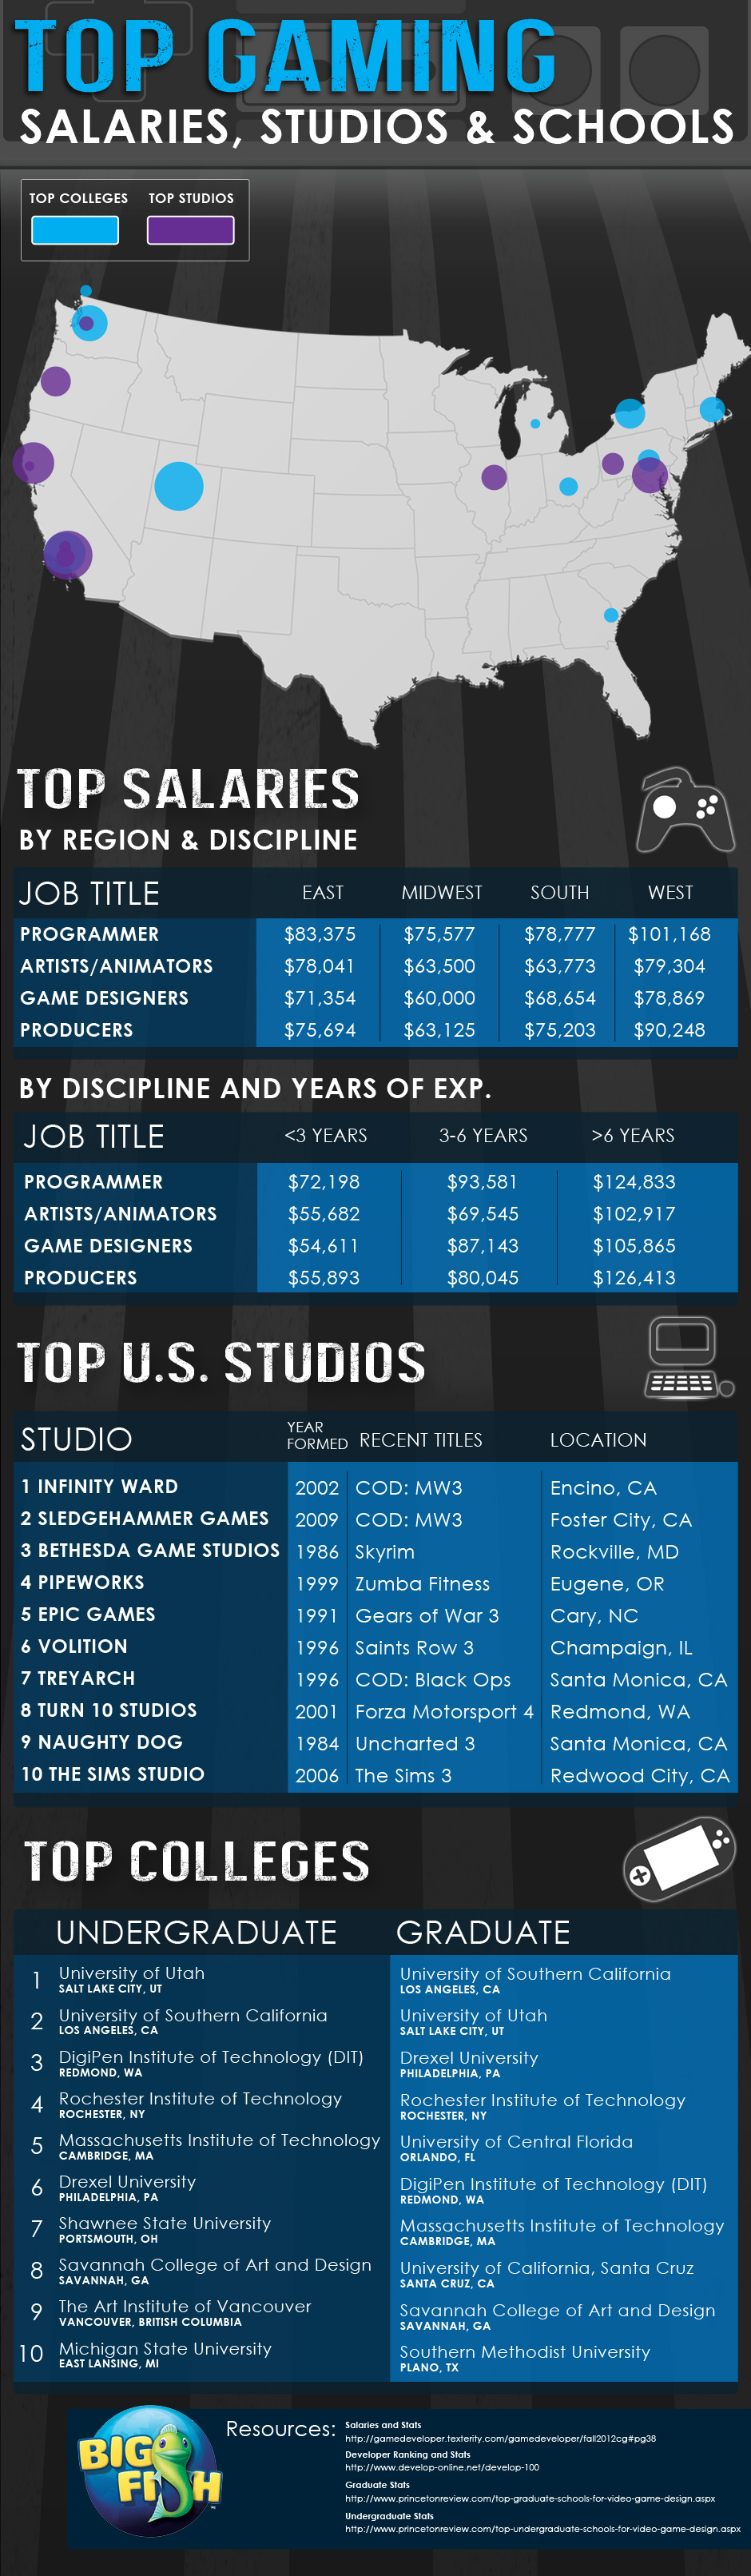 Video Game Industry - Top Studios, Schools and Salaries